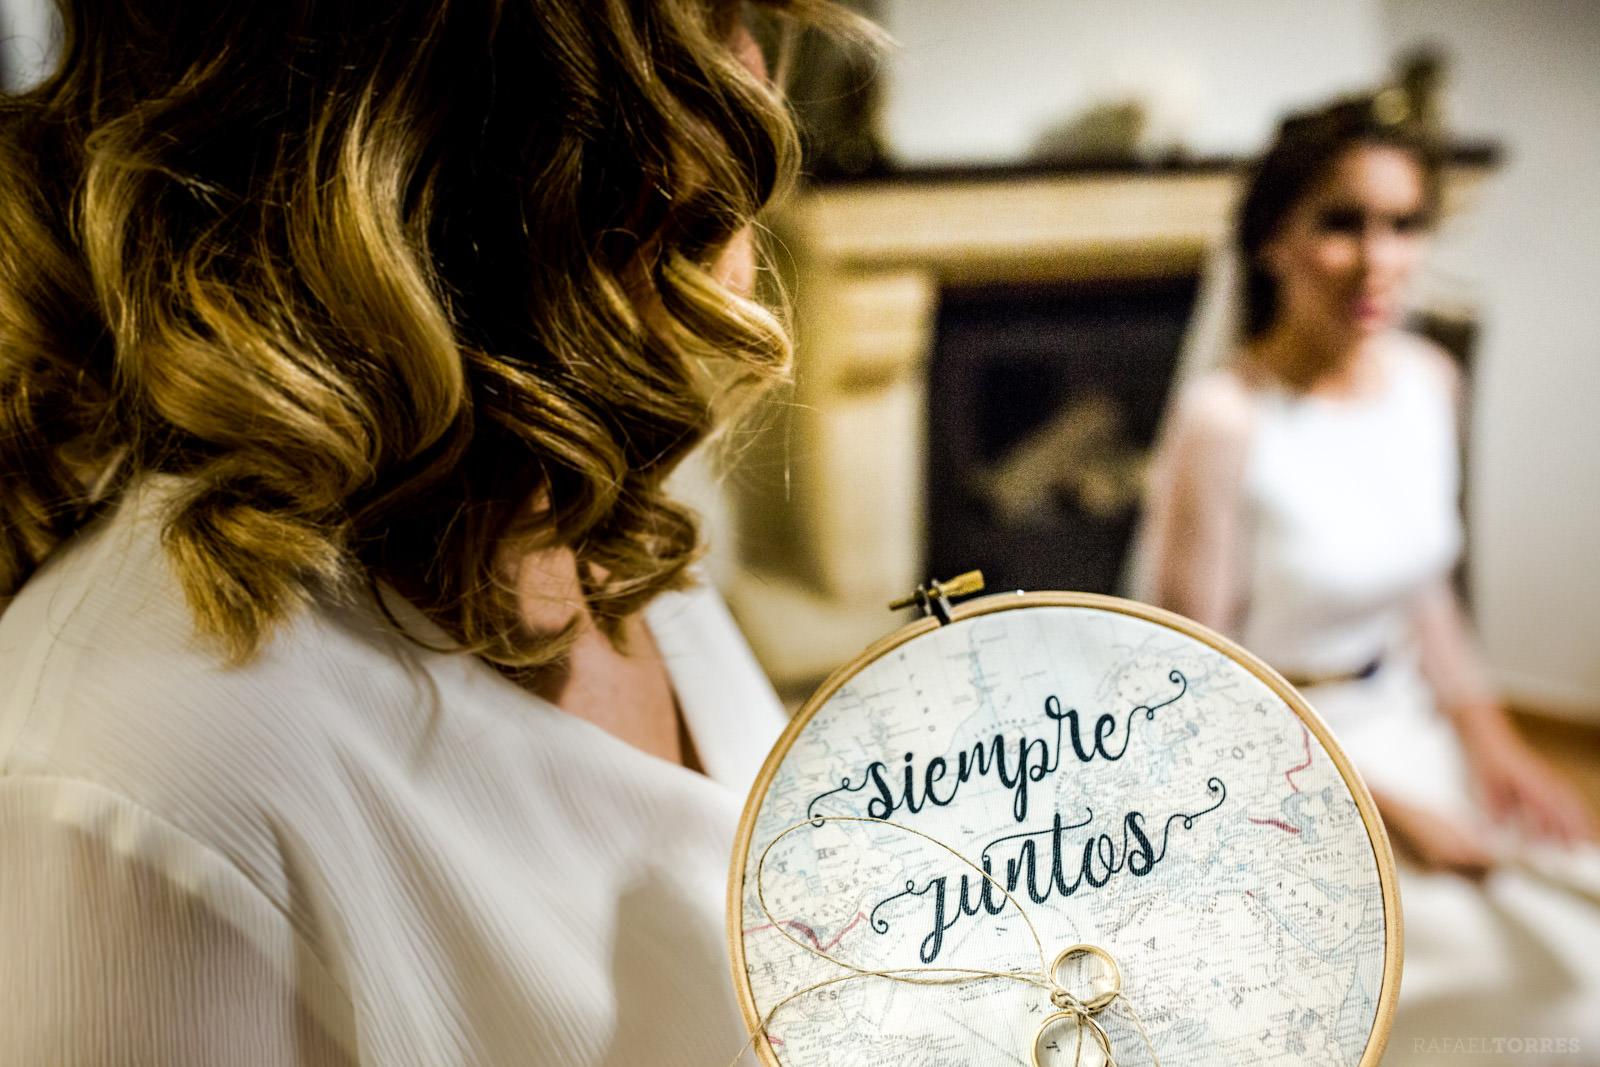 Rafael+Torres+fotografo+bodas+sevilla+madrid+barcelona+wedding+photographer+bodas+diferentes+bodaensevilla+molinillos+fotografo+hacienda+oran+alfonso+wedding+photographer-19.jpg